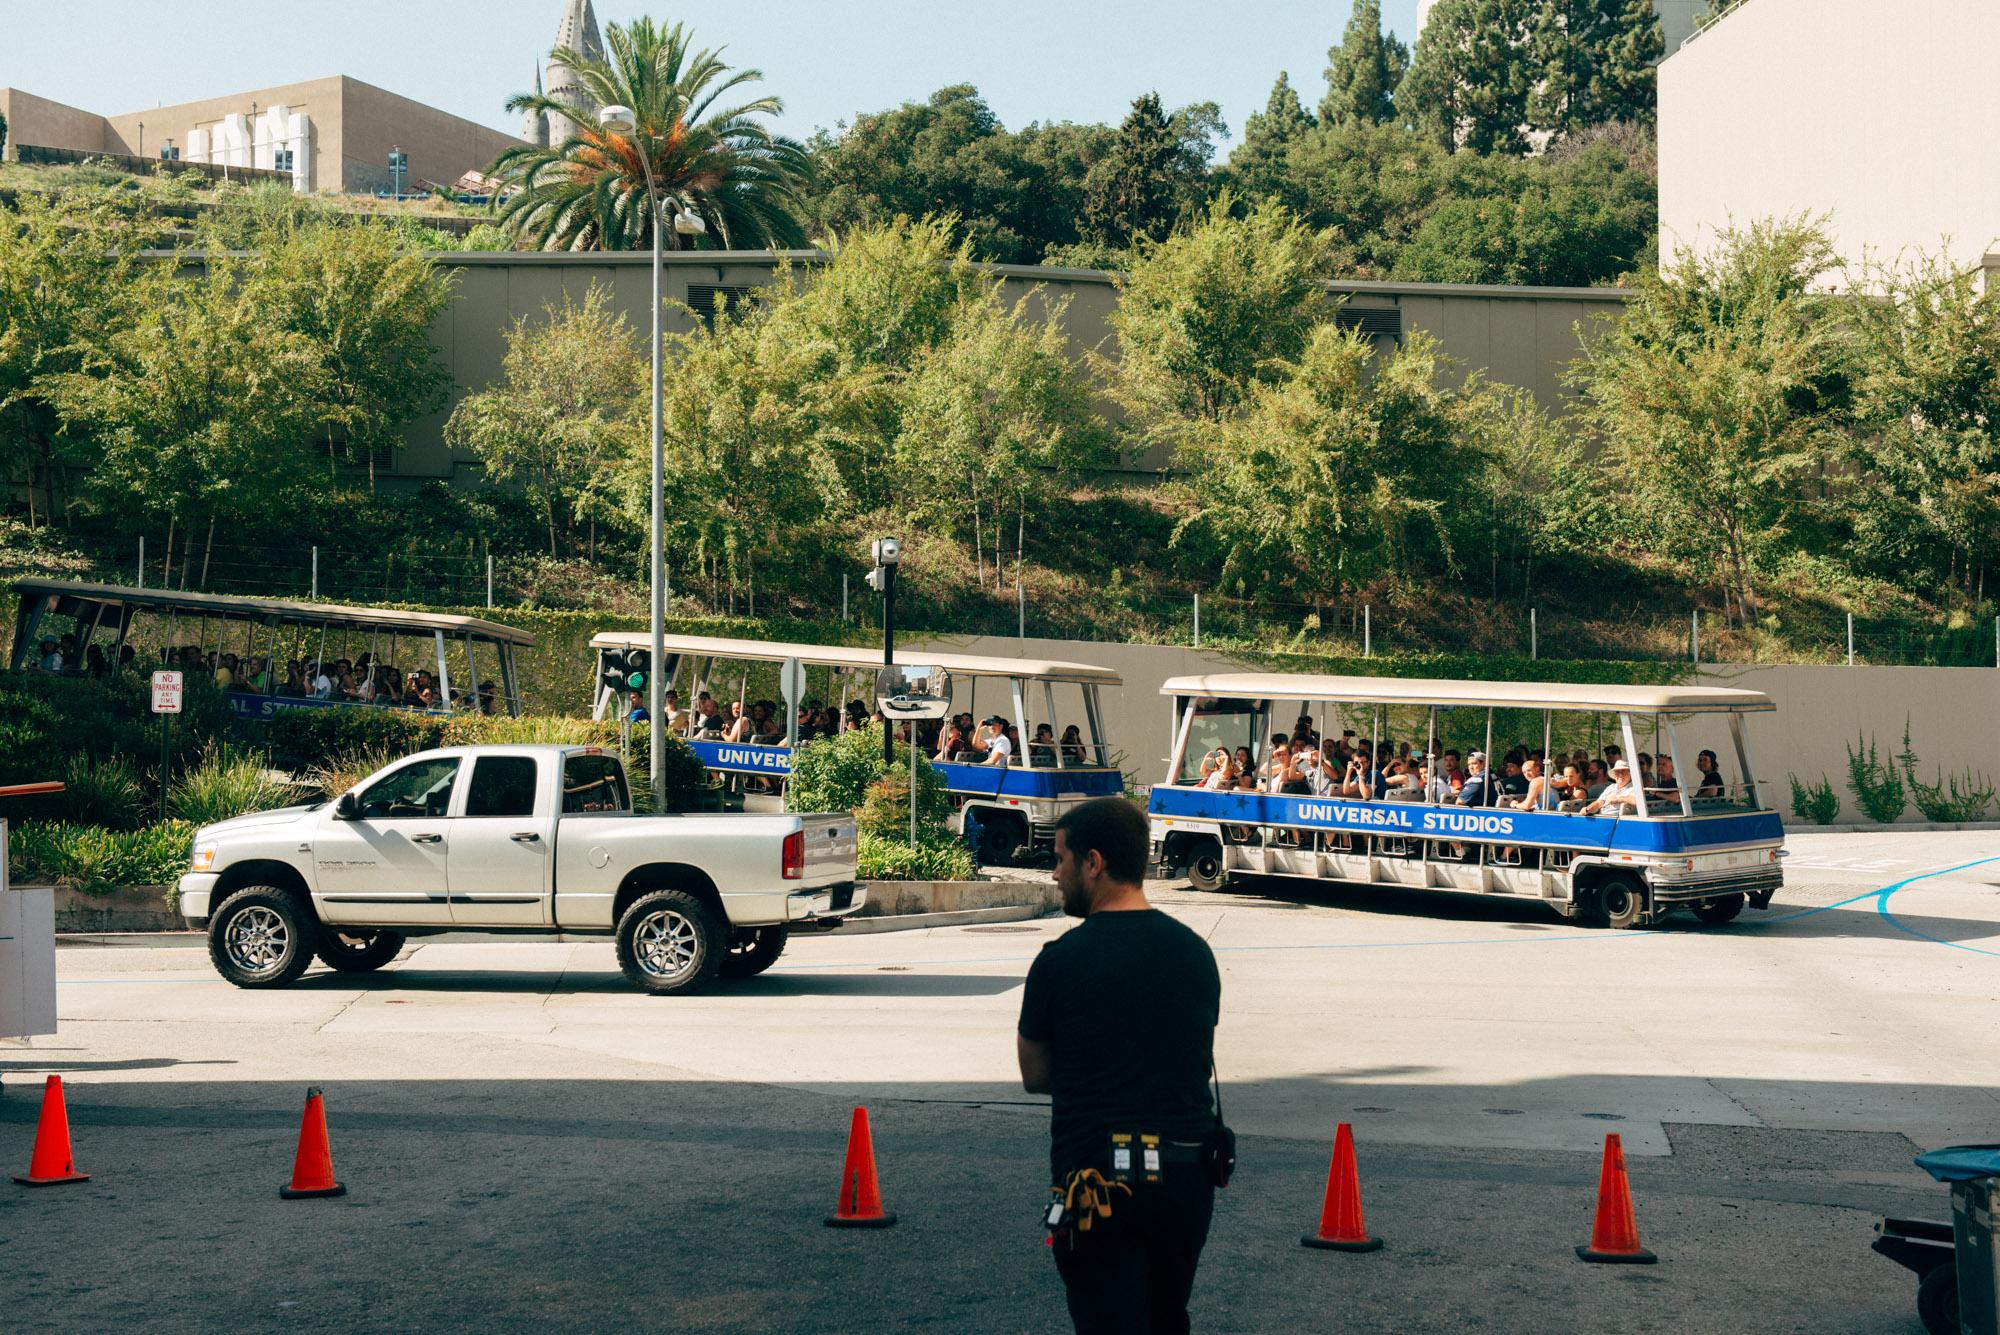 Universal Studios tour passing our set